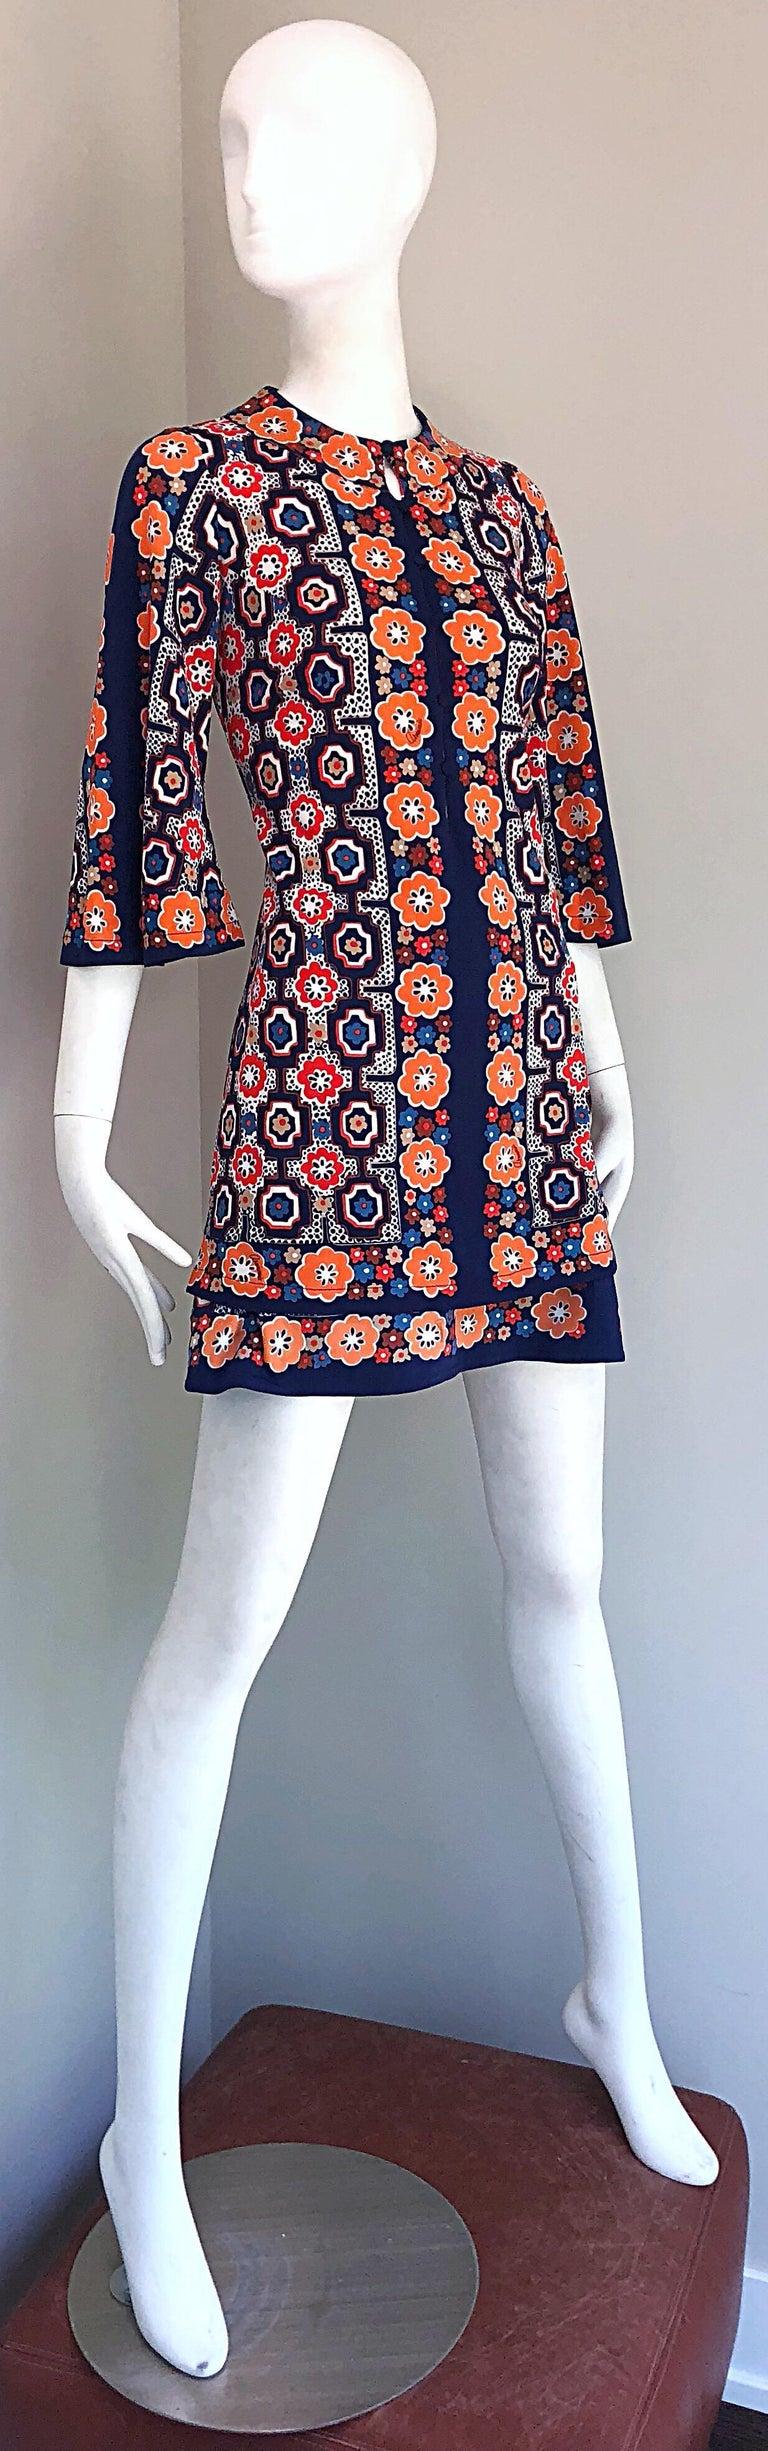 1960s Armonia Italian Jersey Bell Sleeve Vintage 60s Mod Tunic + Mini Skirt For Sale 5